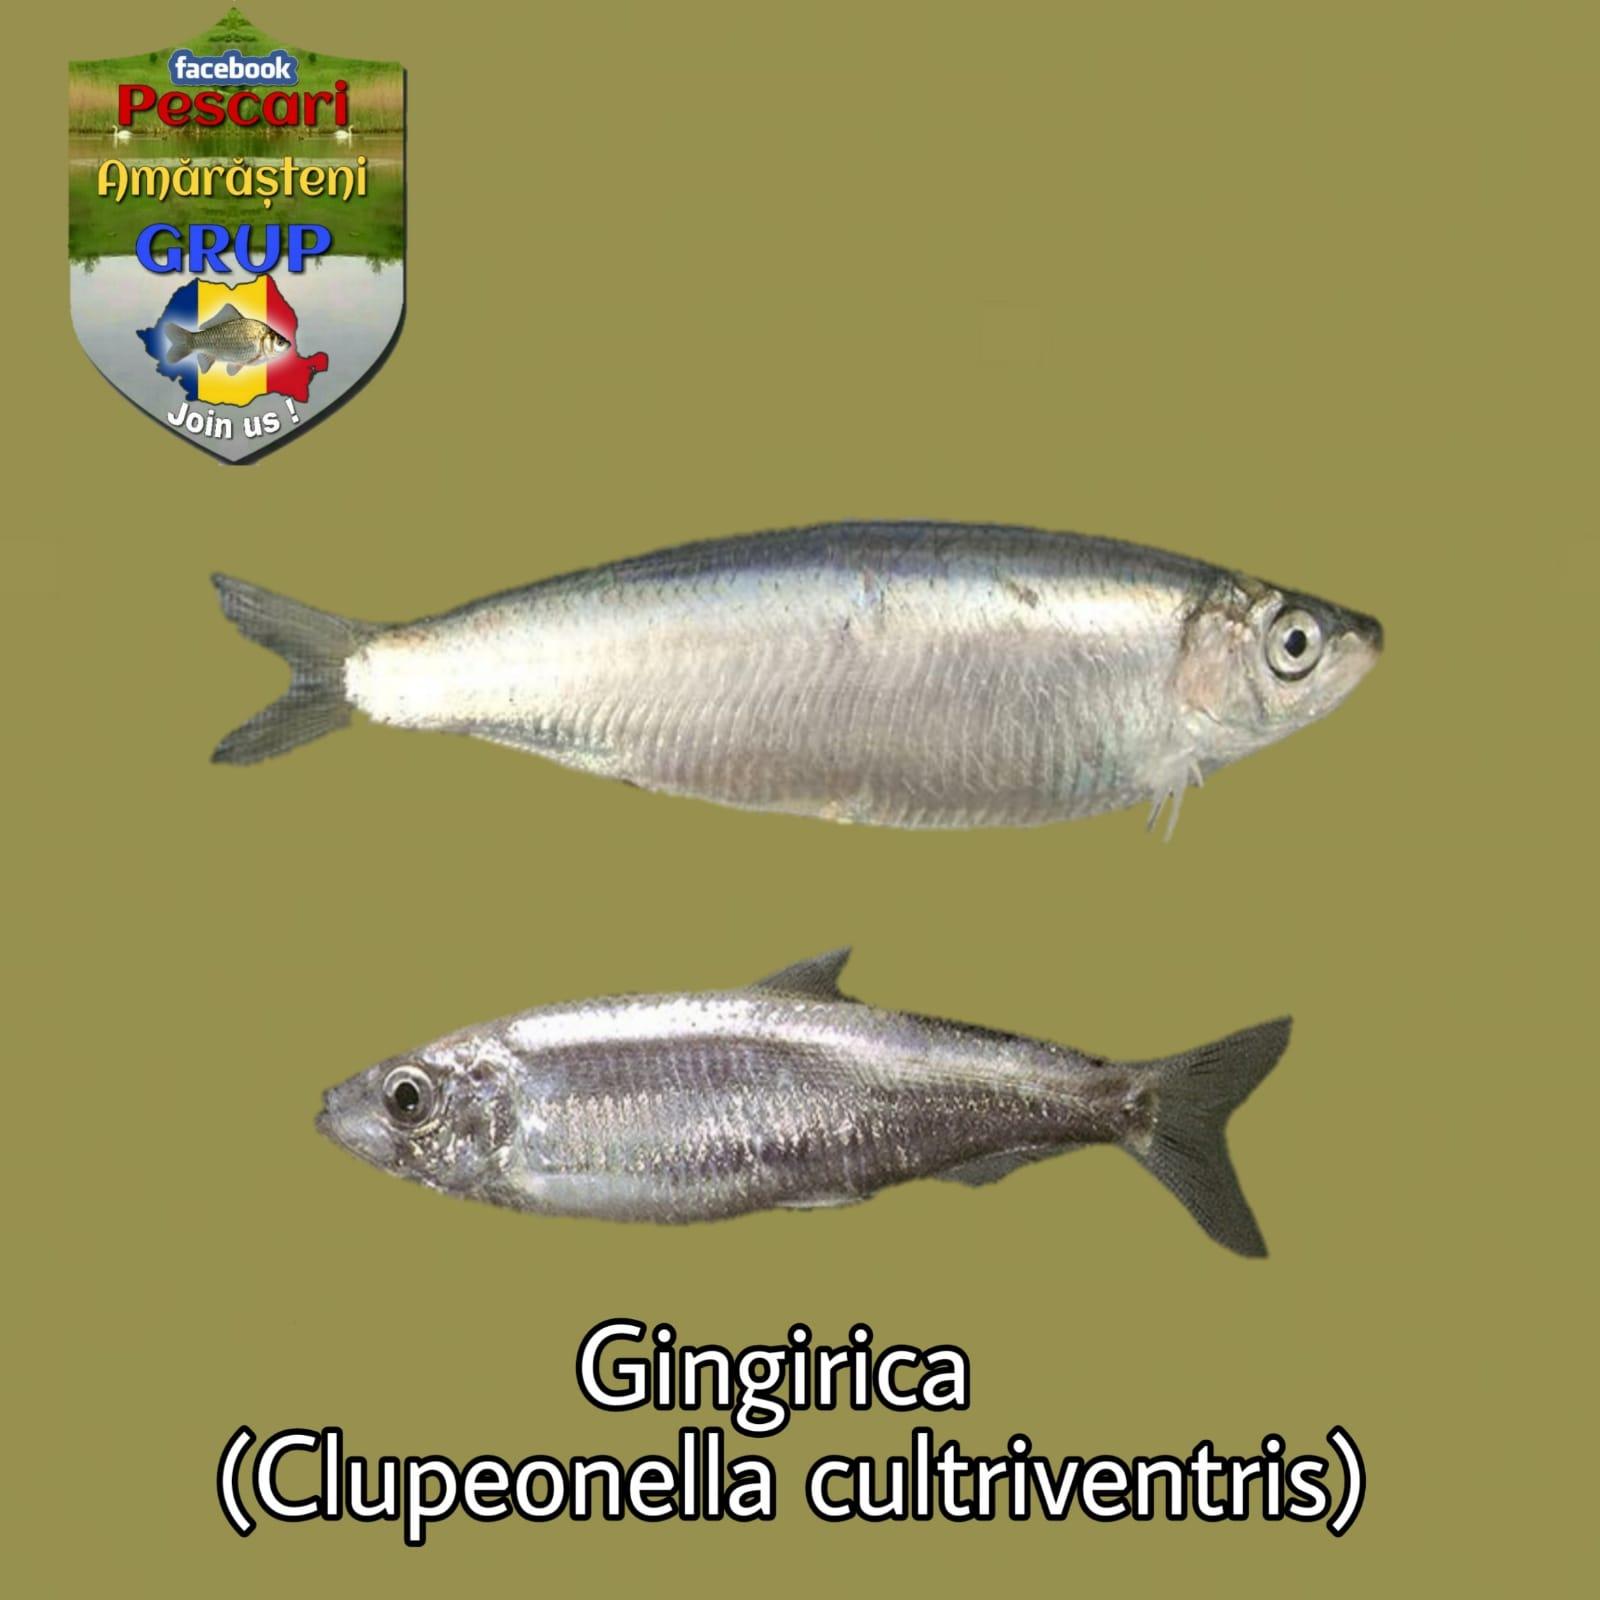 Gingirica (Clupeonella cultriventris)